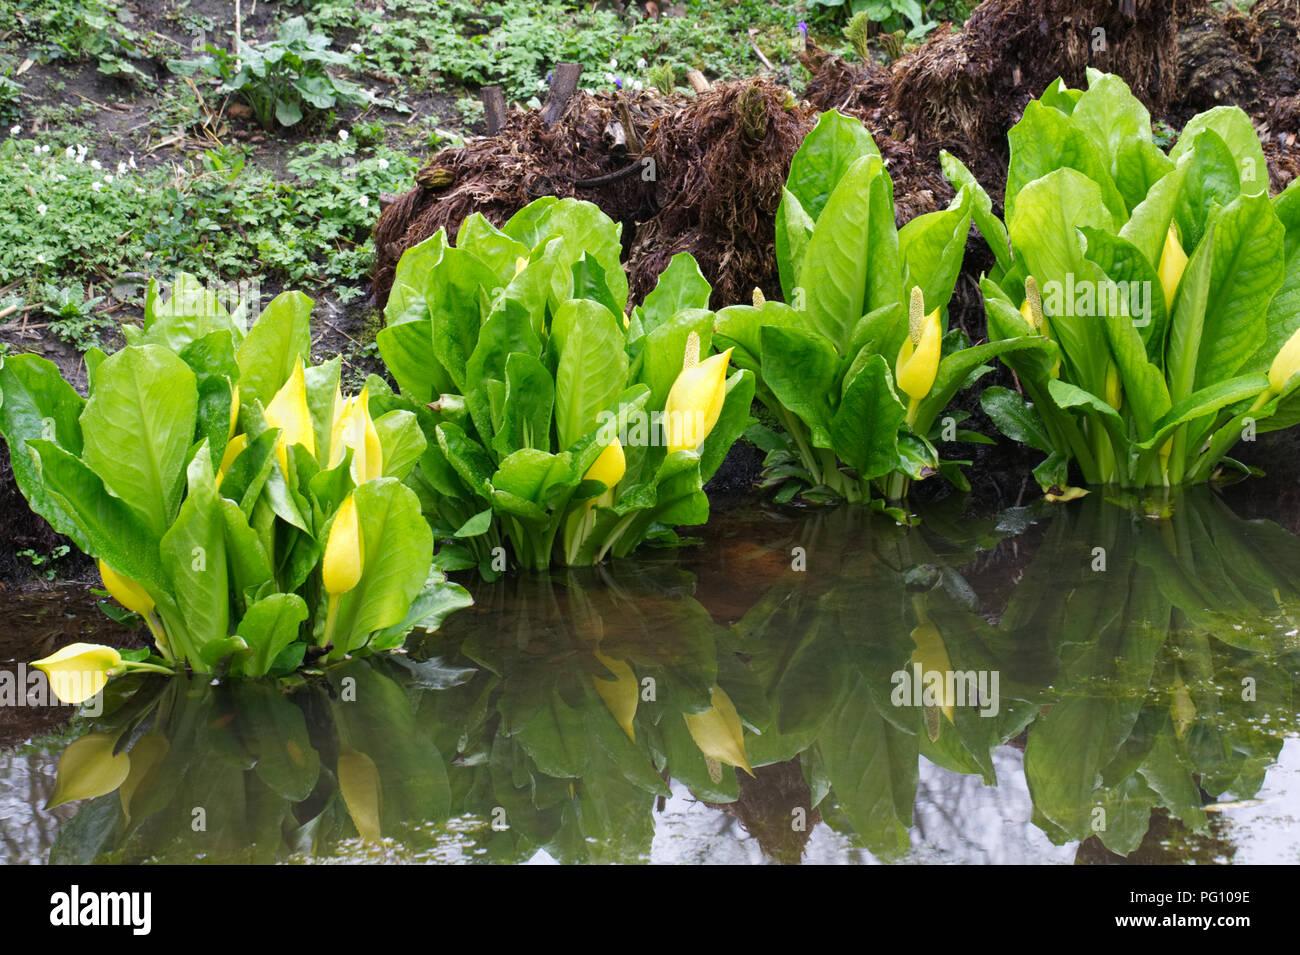 Lysichiton americanus. Western skunk cabbage in an English bog garden. - Stock Image